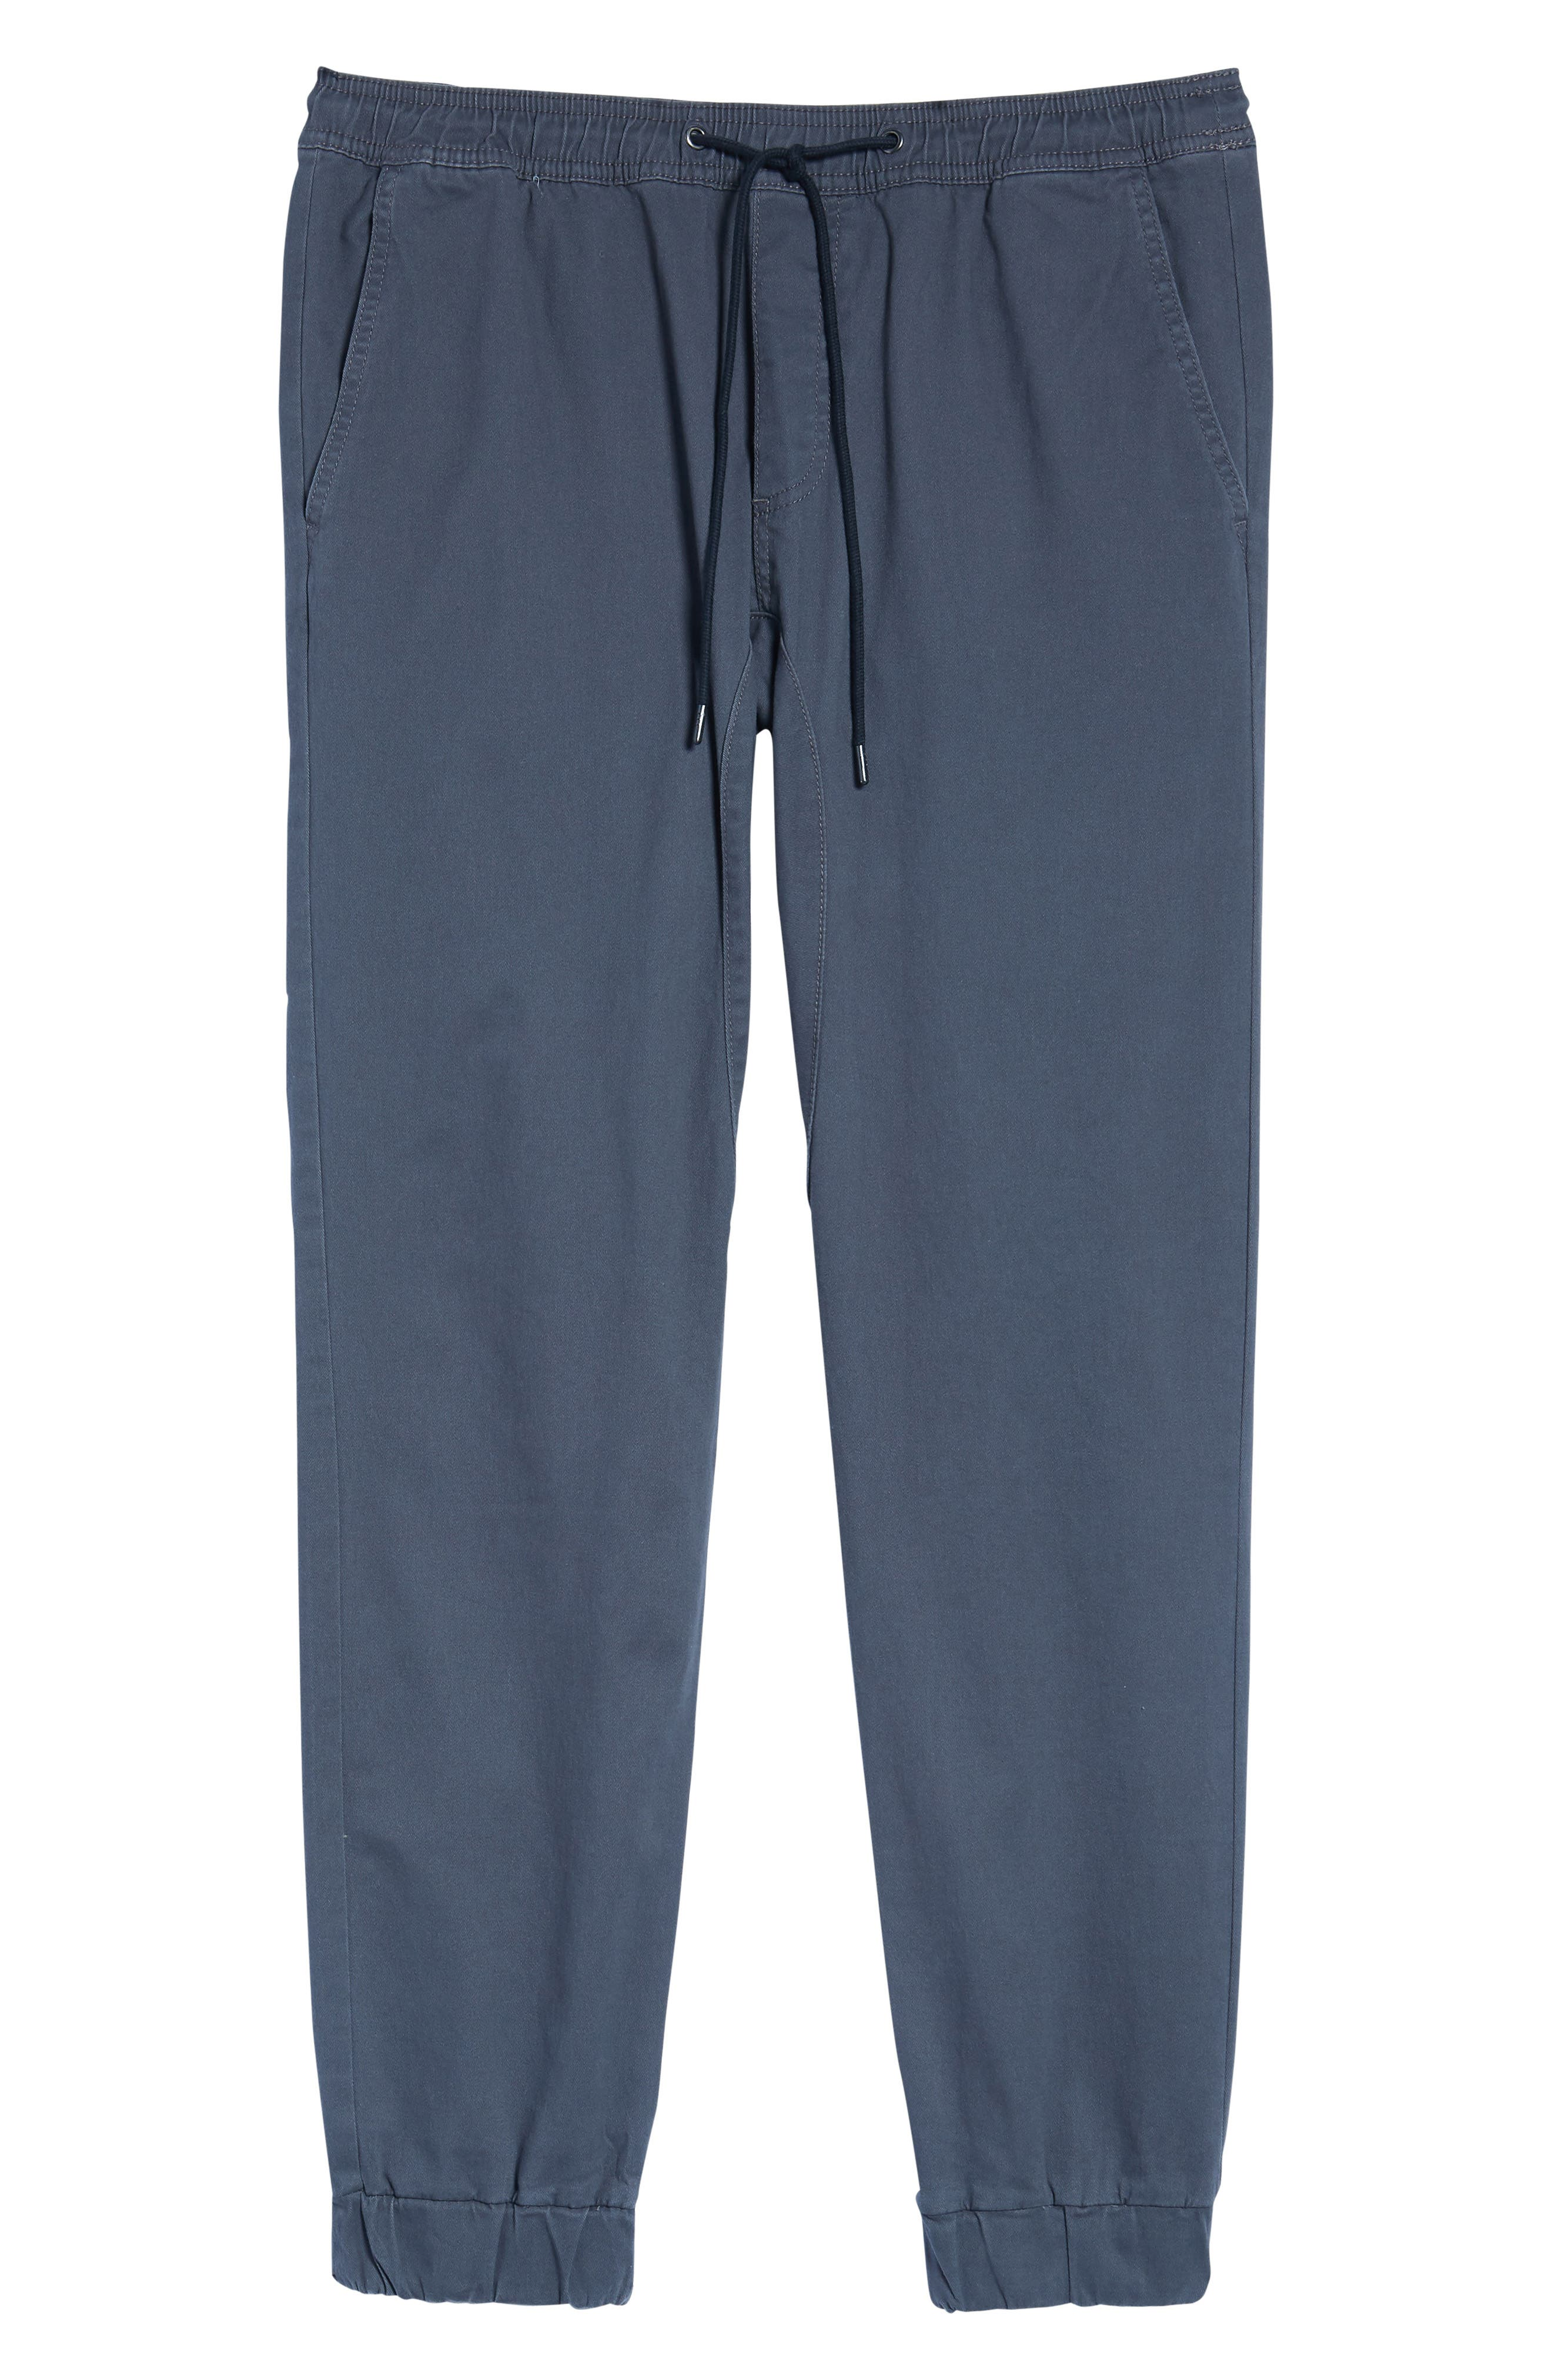 Jogger Pants,                             Alternate thumbnail 6, color,                             Grey Onyx